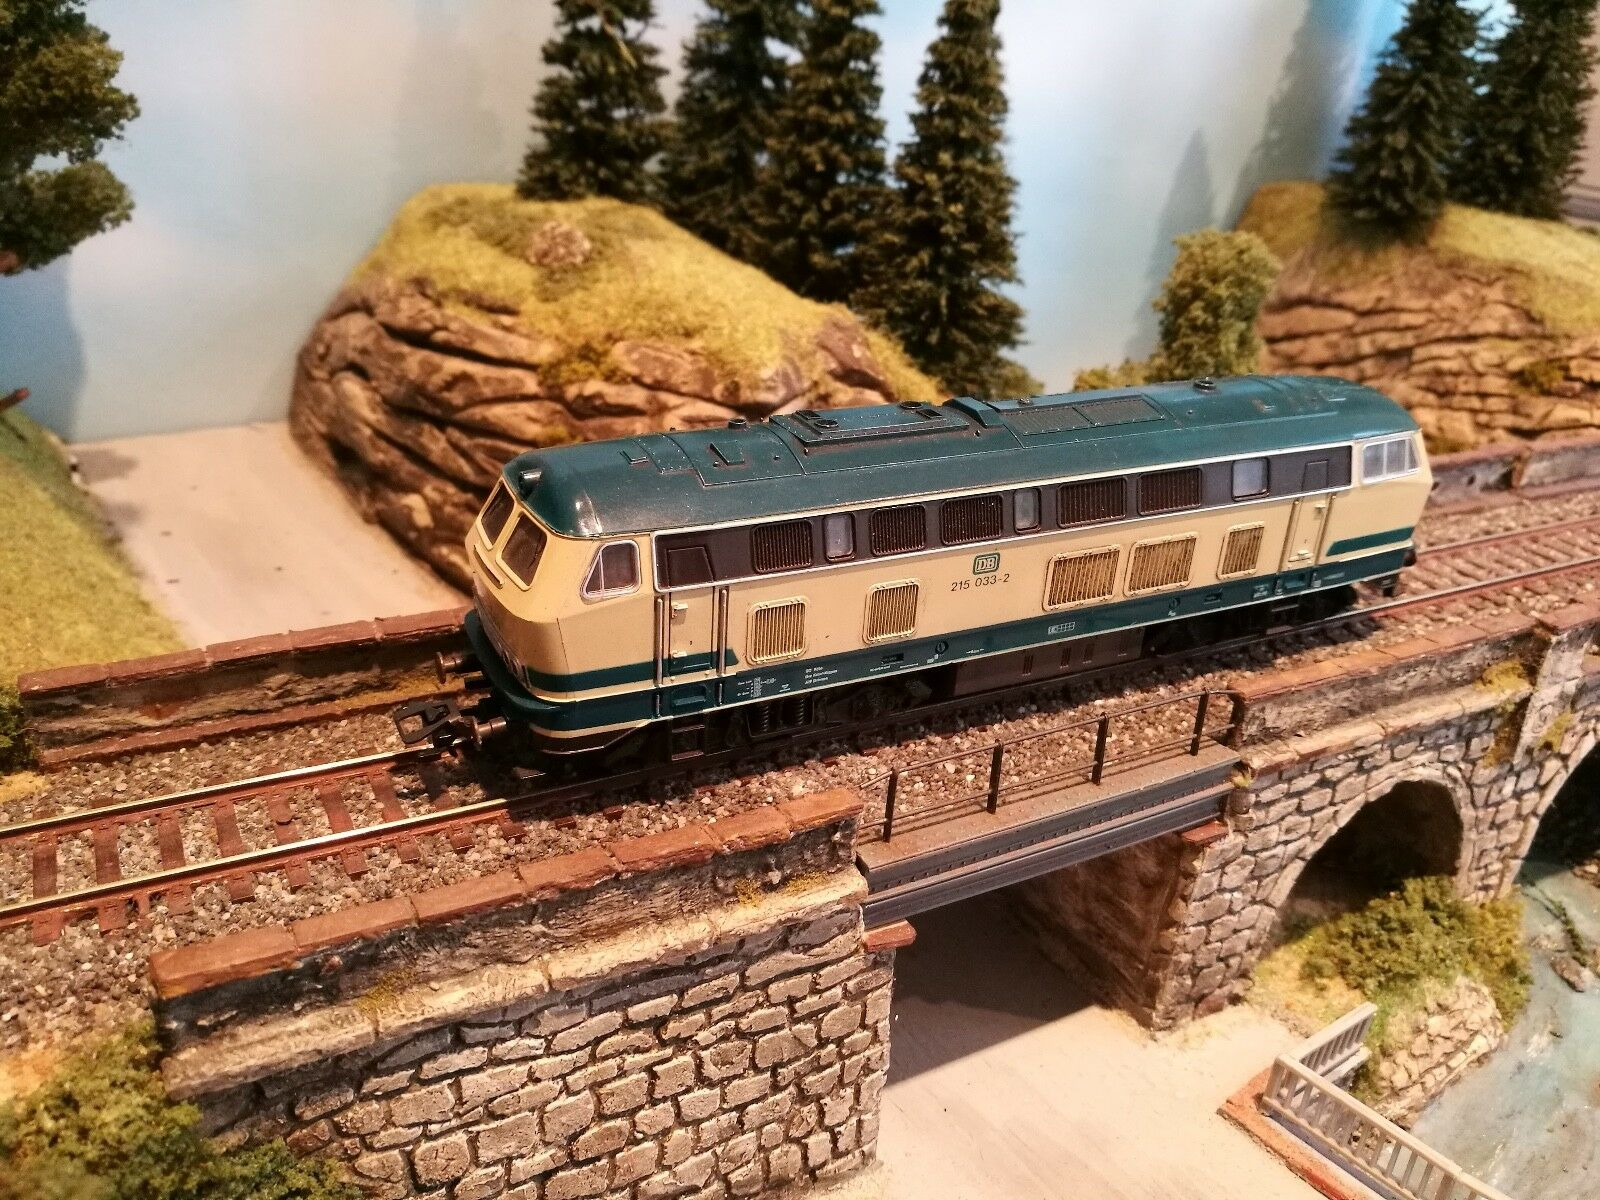 ROCO 43450/04151 B h0 Diesel locomotiva V 215 033-2 delle DB